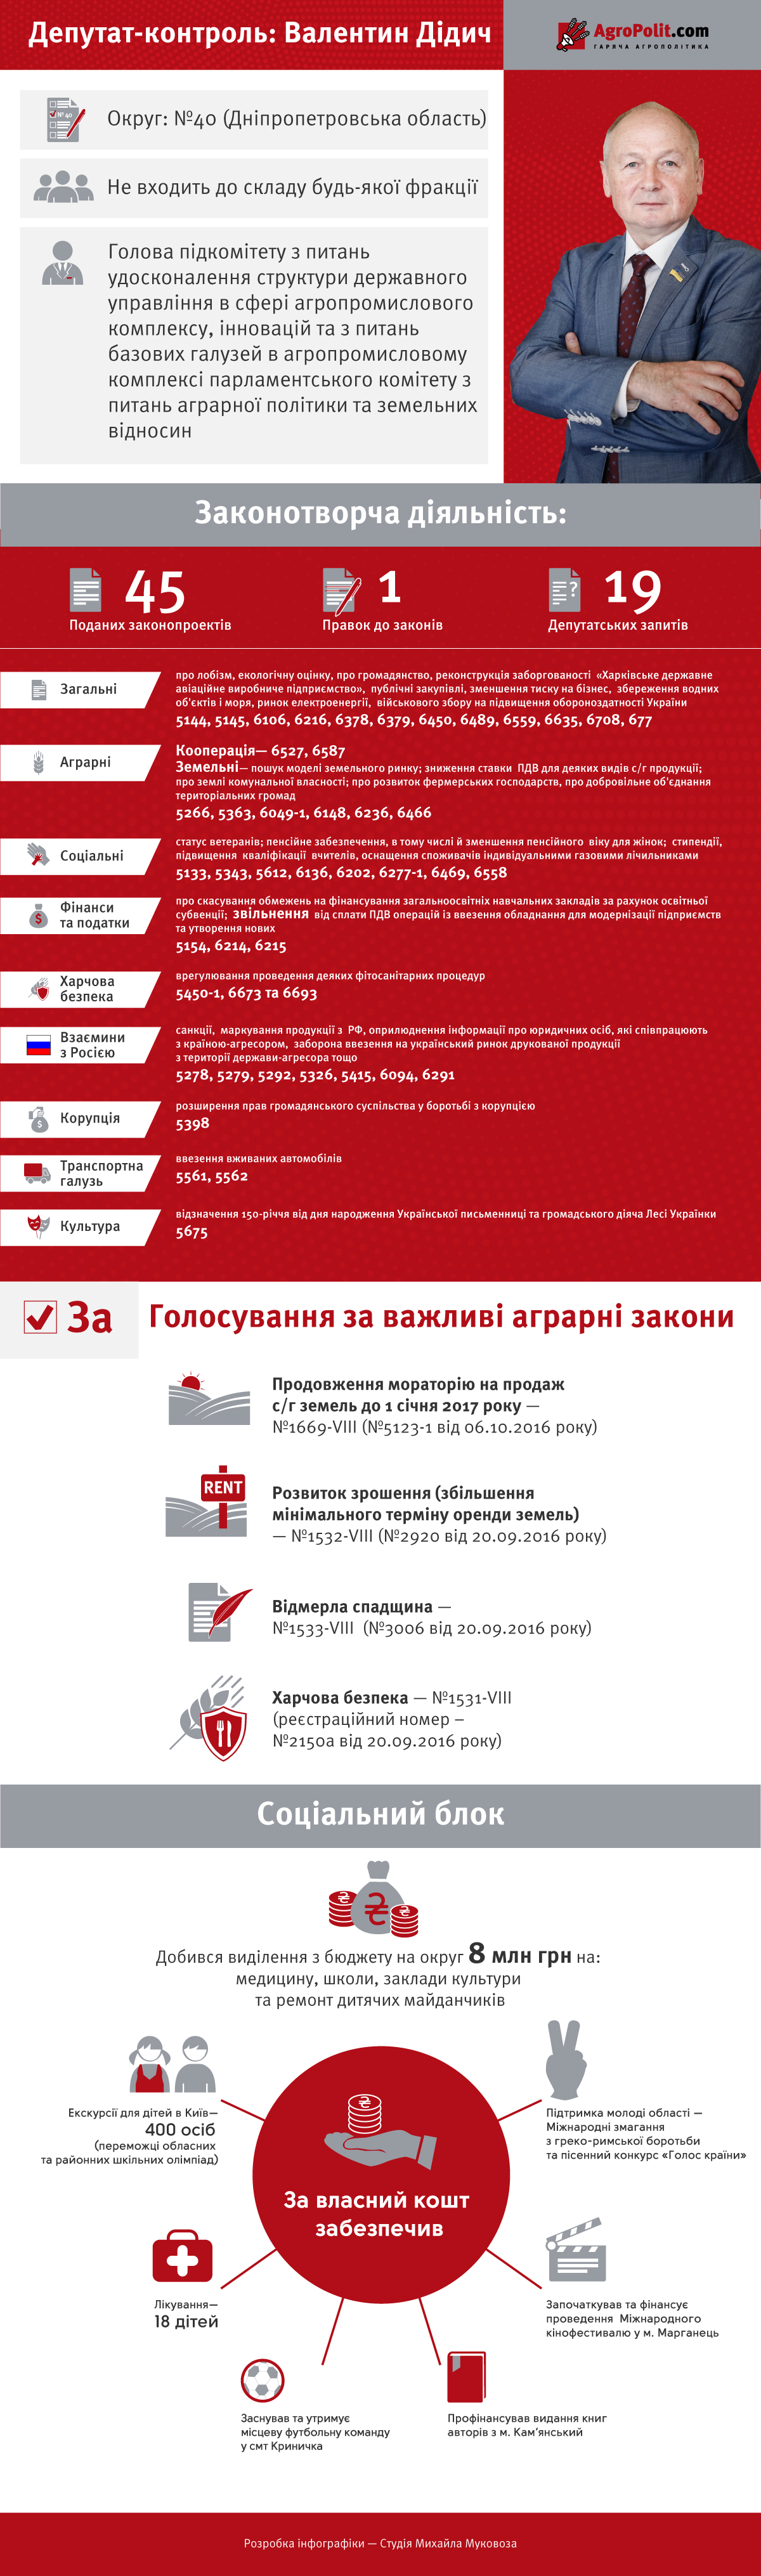 diduch-Valentin-infografika